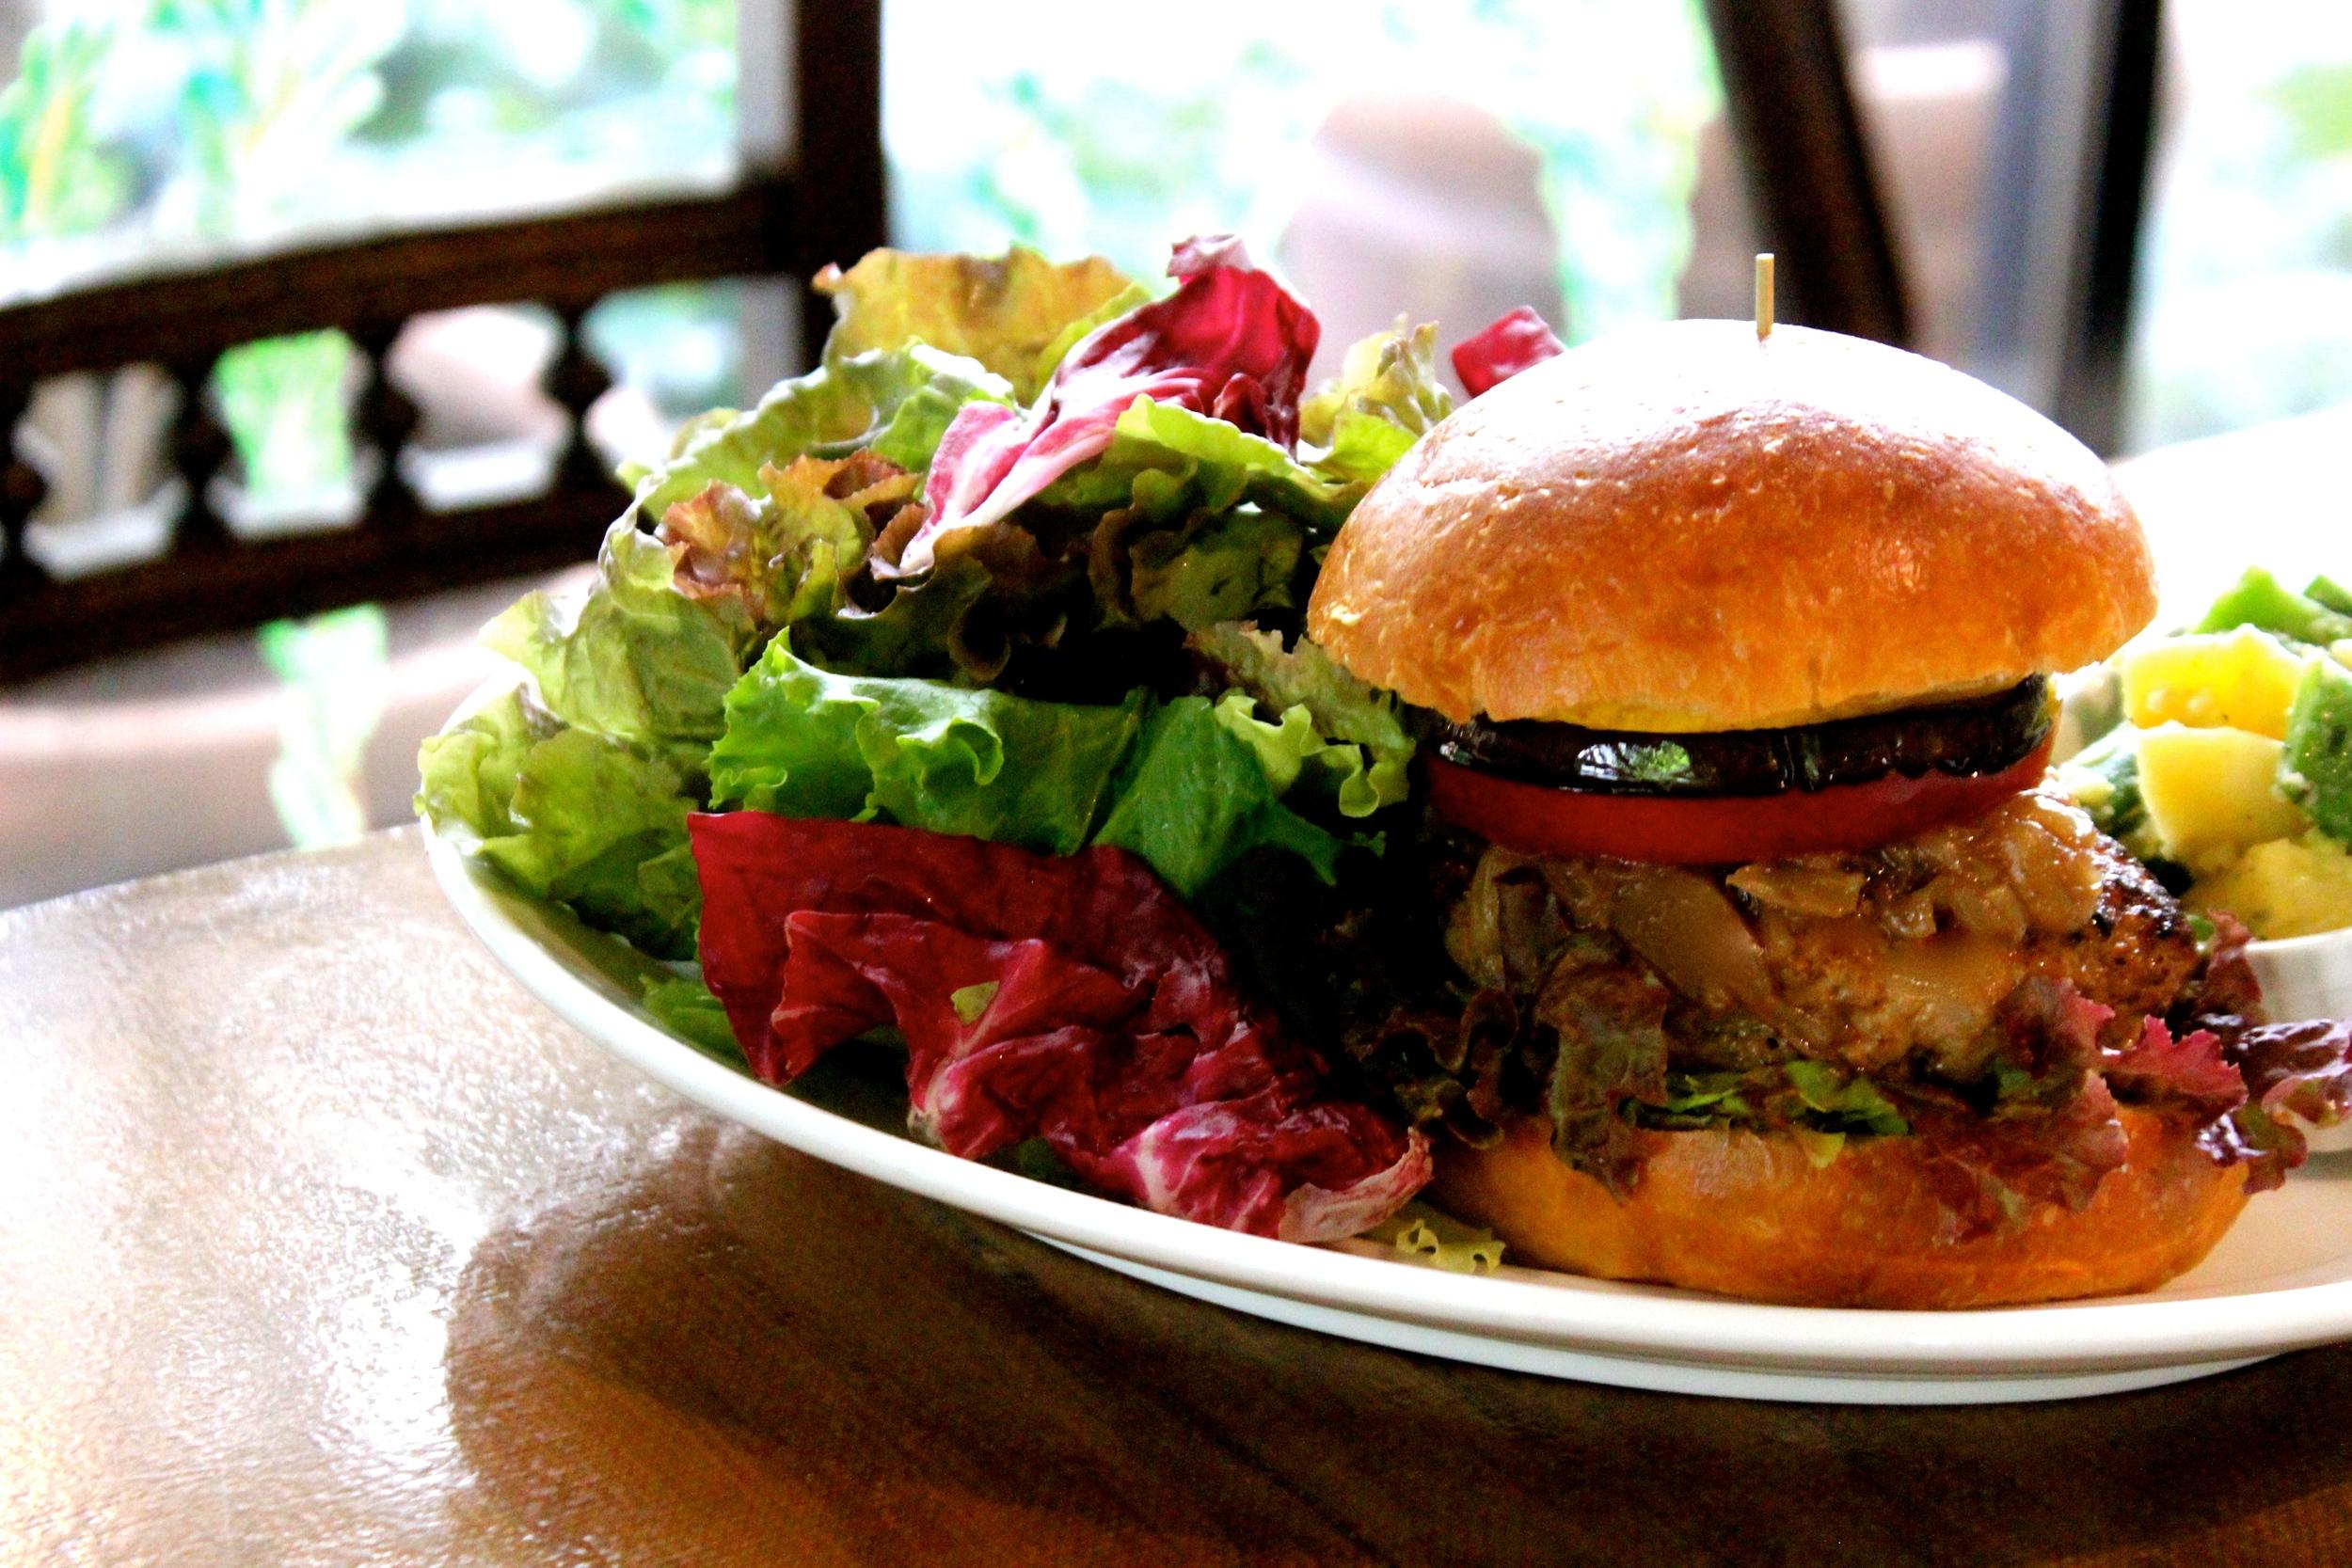 8th Anniversary Special menu:Duroc Form Pork Burger with Tomato, Egg Plant, Zucchini, Caramel Onion & Balsamico